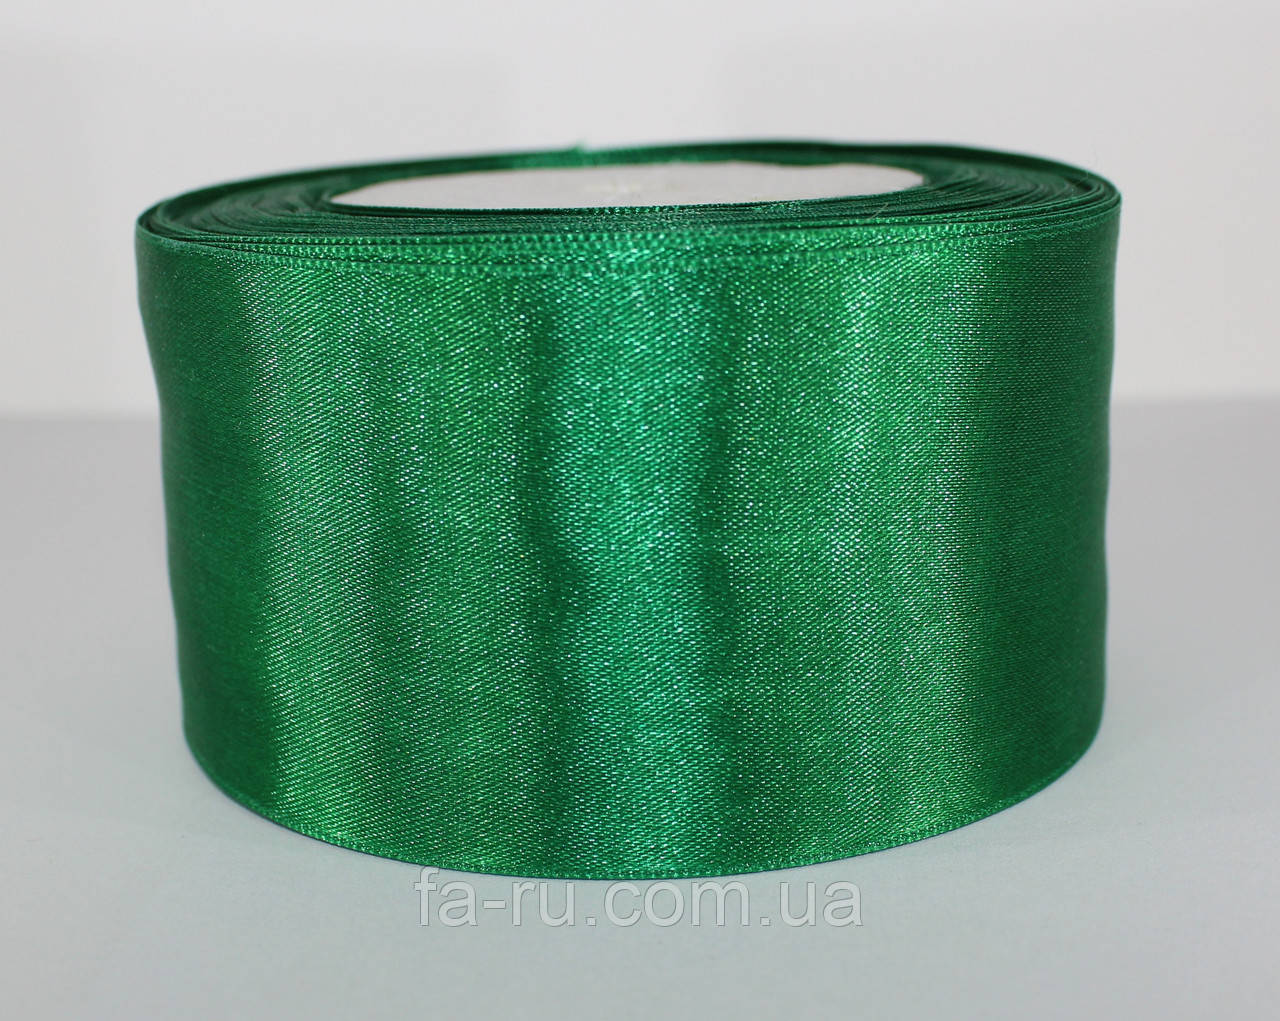 Лента атласная. Цвет - темно-зеленый. Ширина - 5 см, длина - 23 м